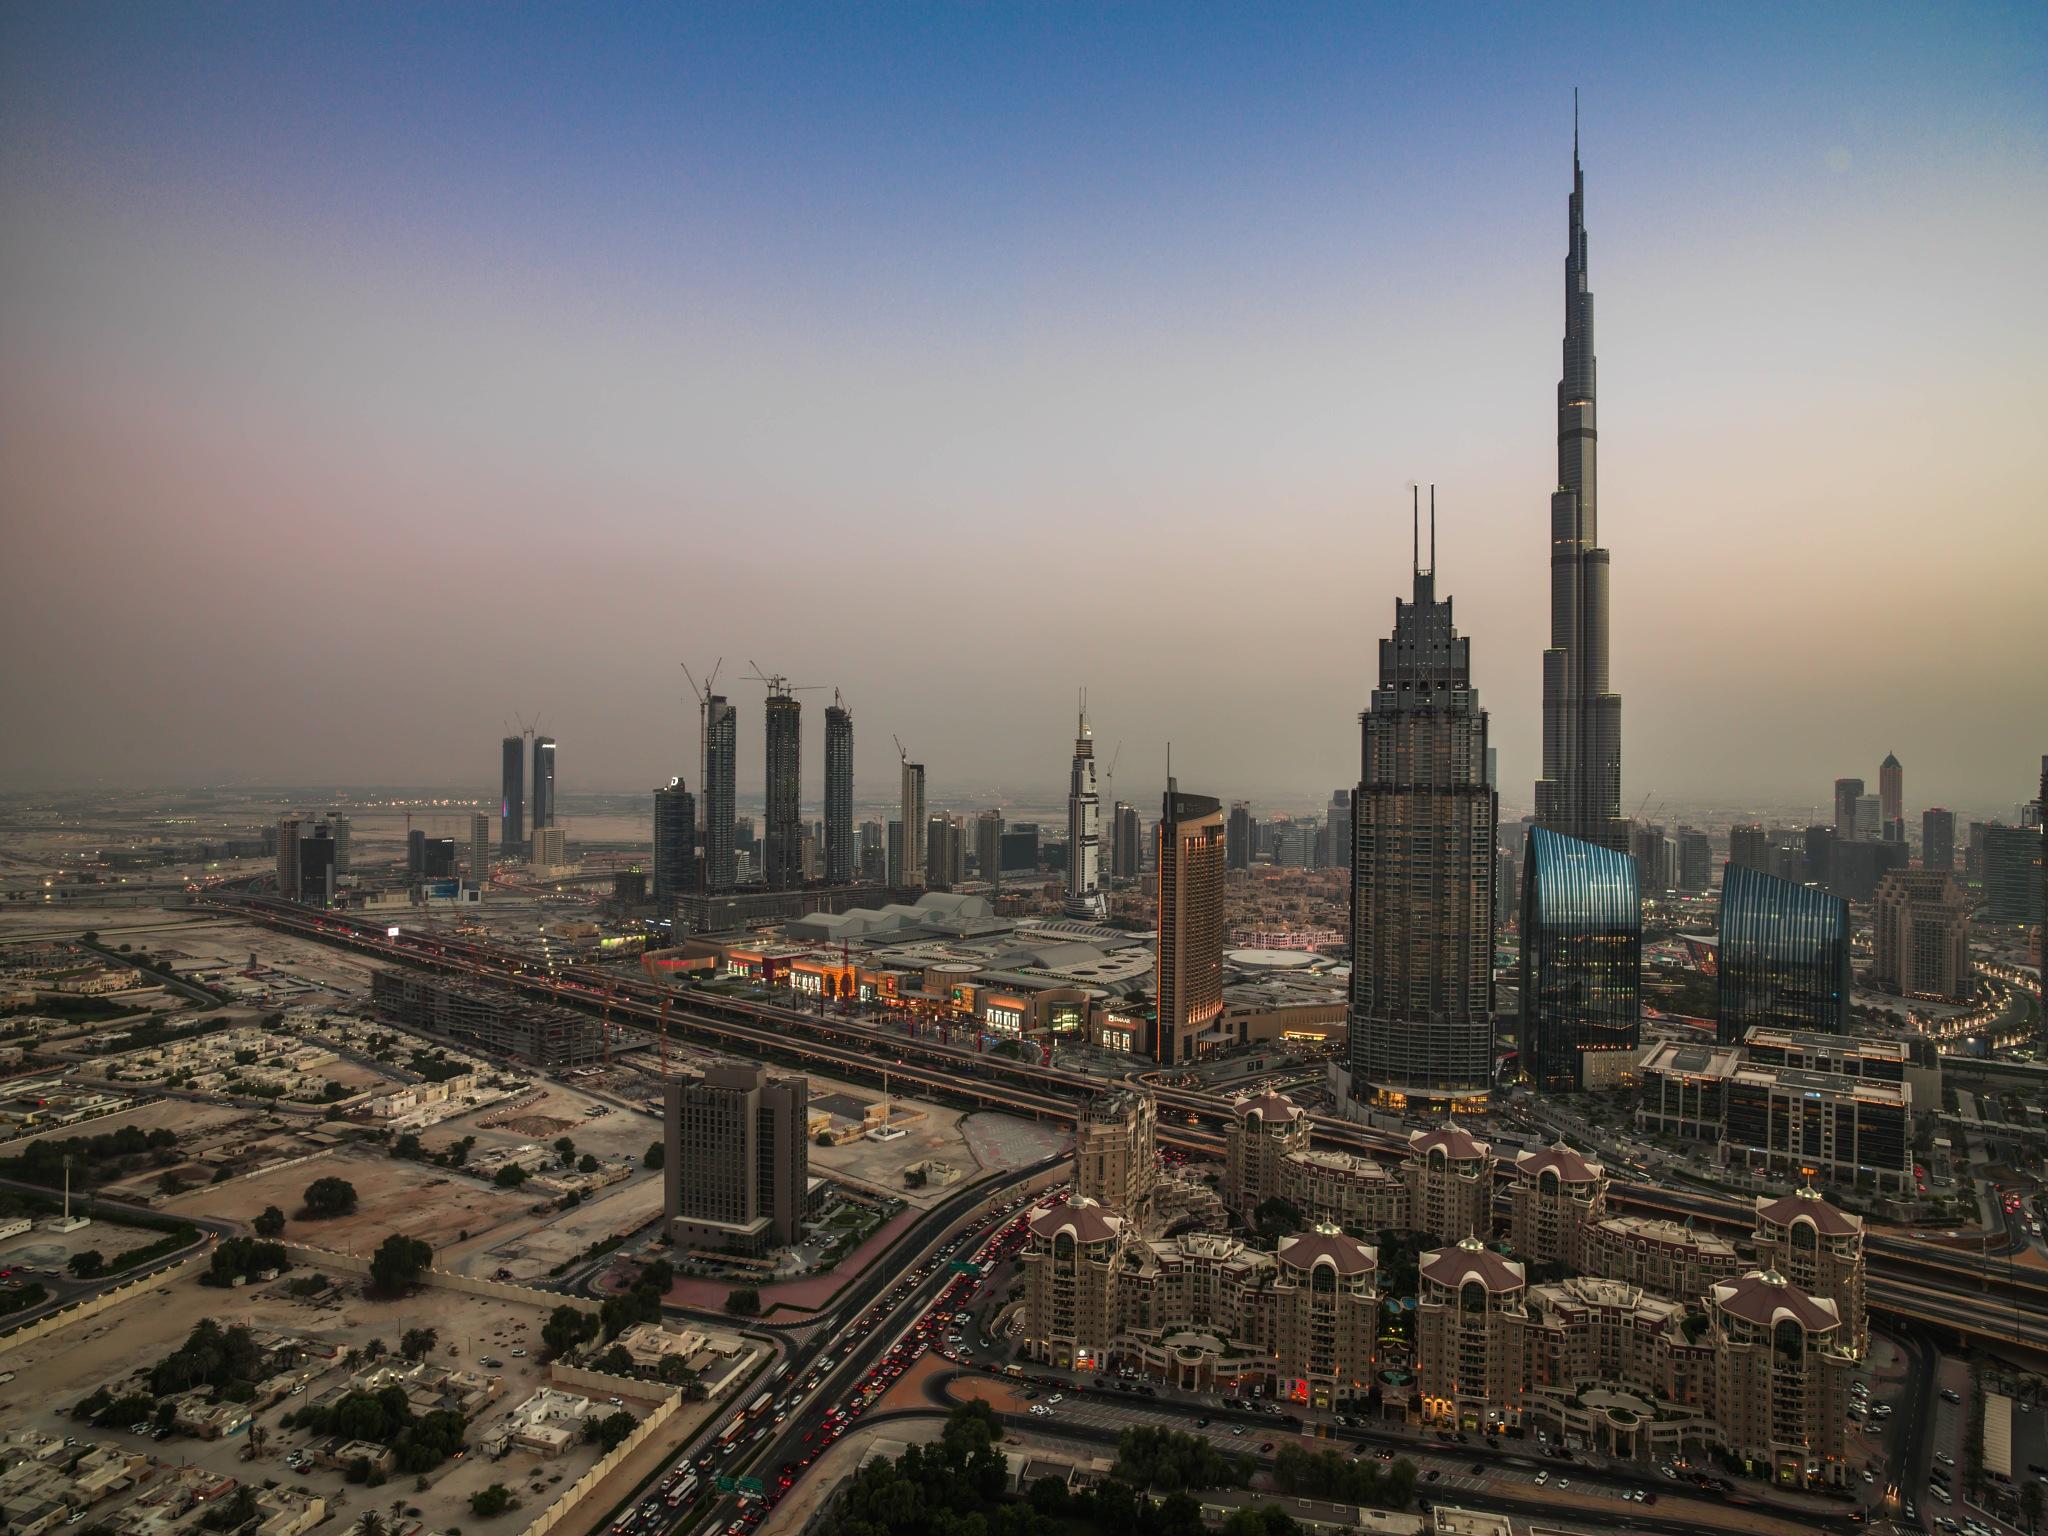 Burj Khalifa and Dubai Mall by muhammad.nasser.963